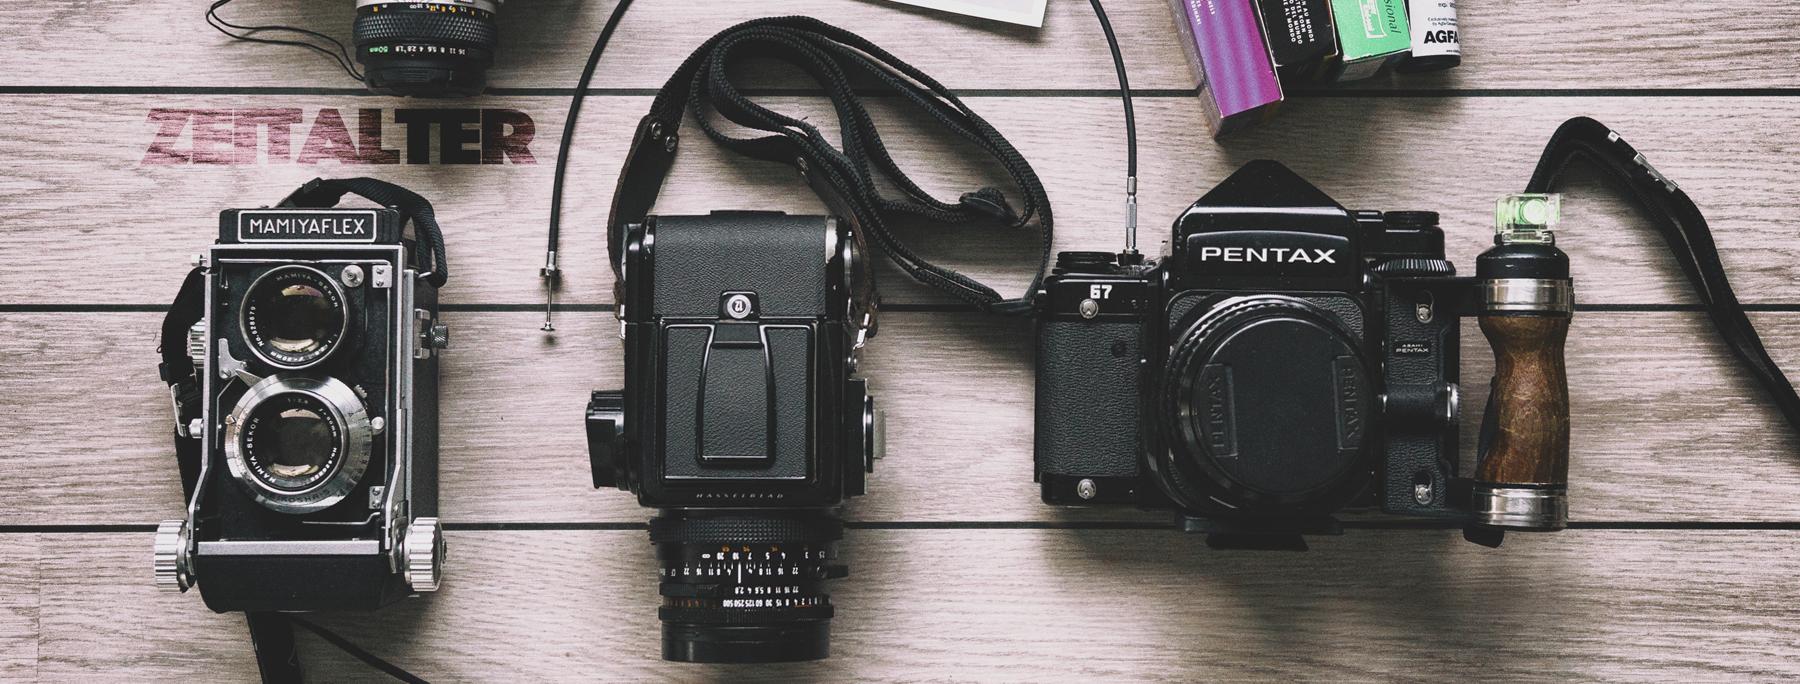 Zeitalter-cameras-smal 04